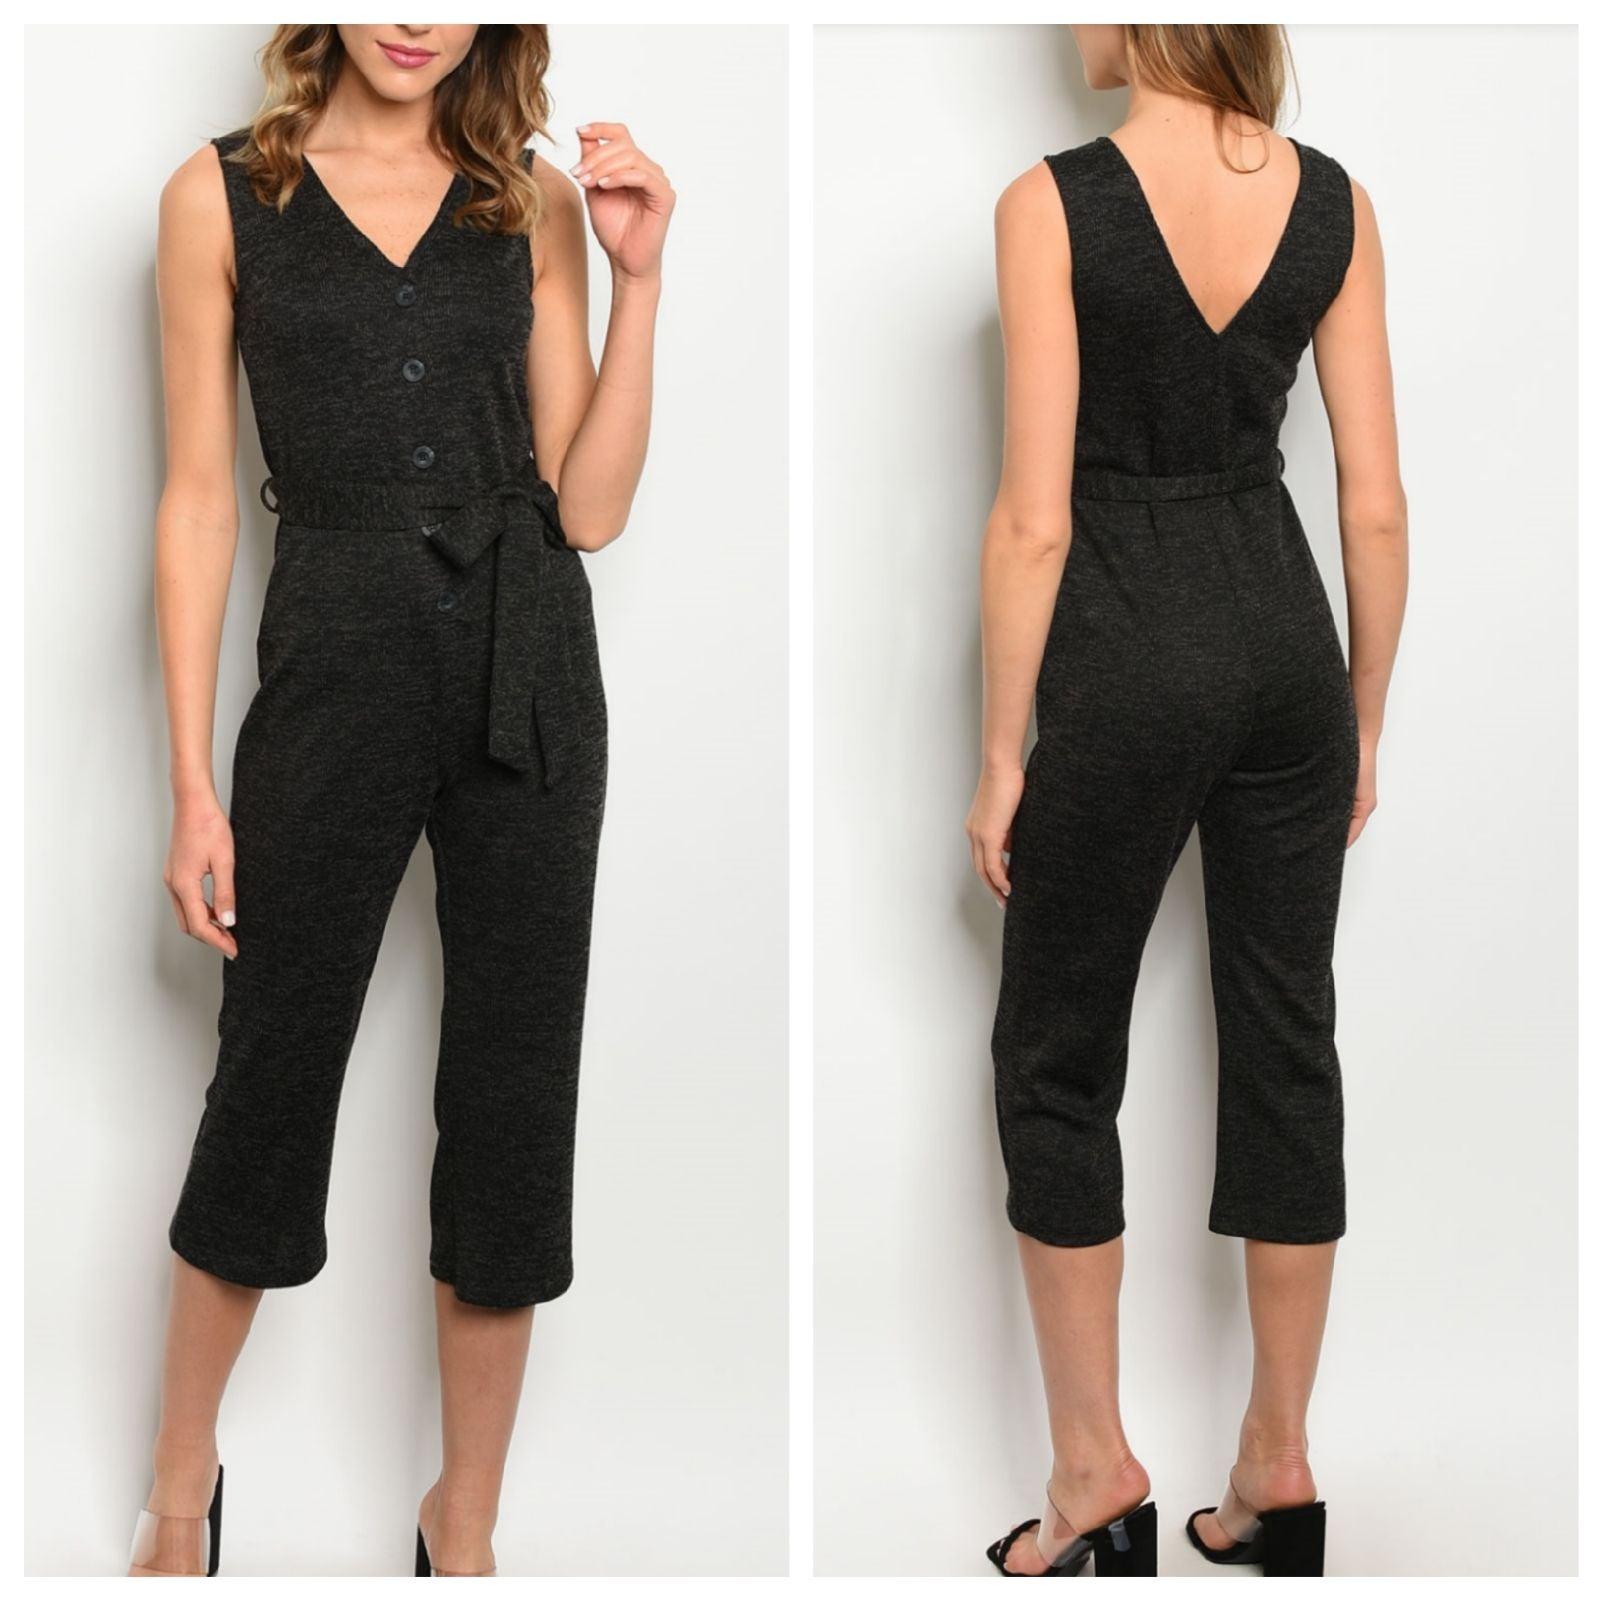 Black Sleeveless V-neck Cropped Jumpsuit